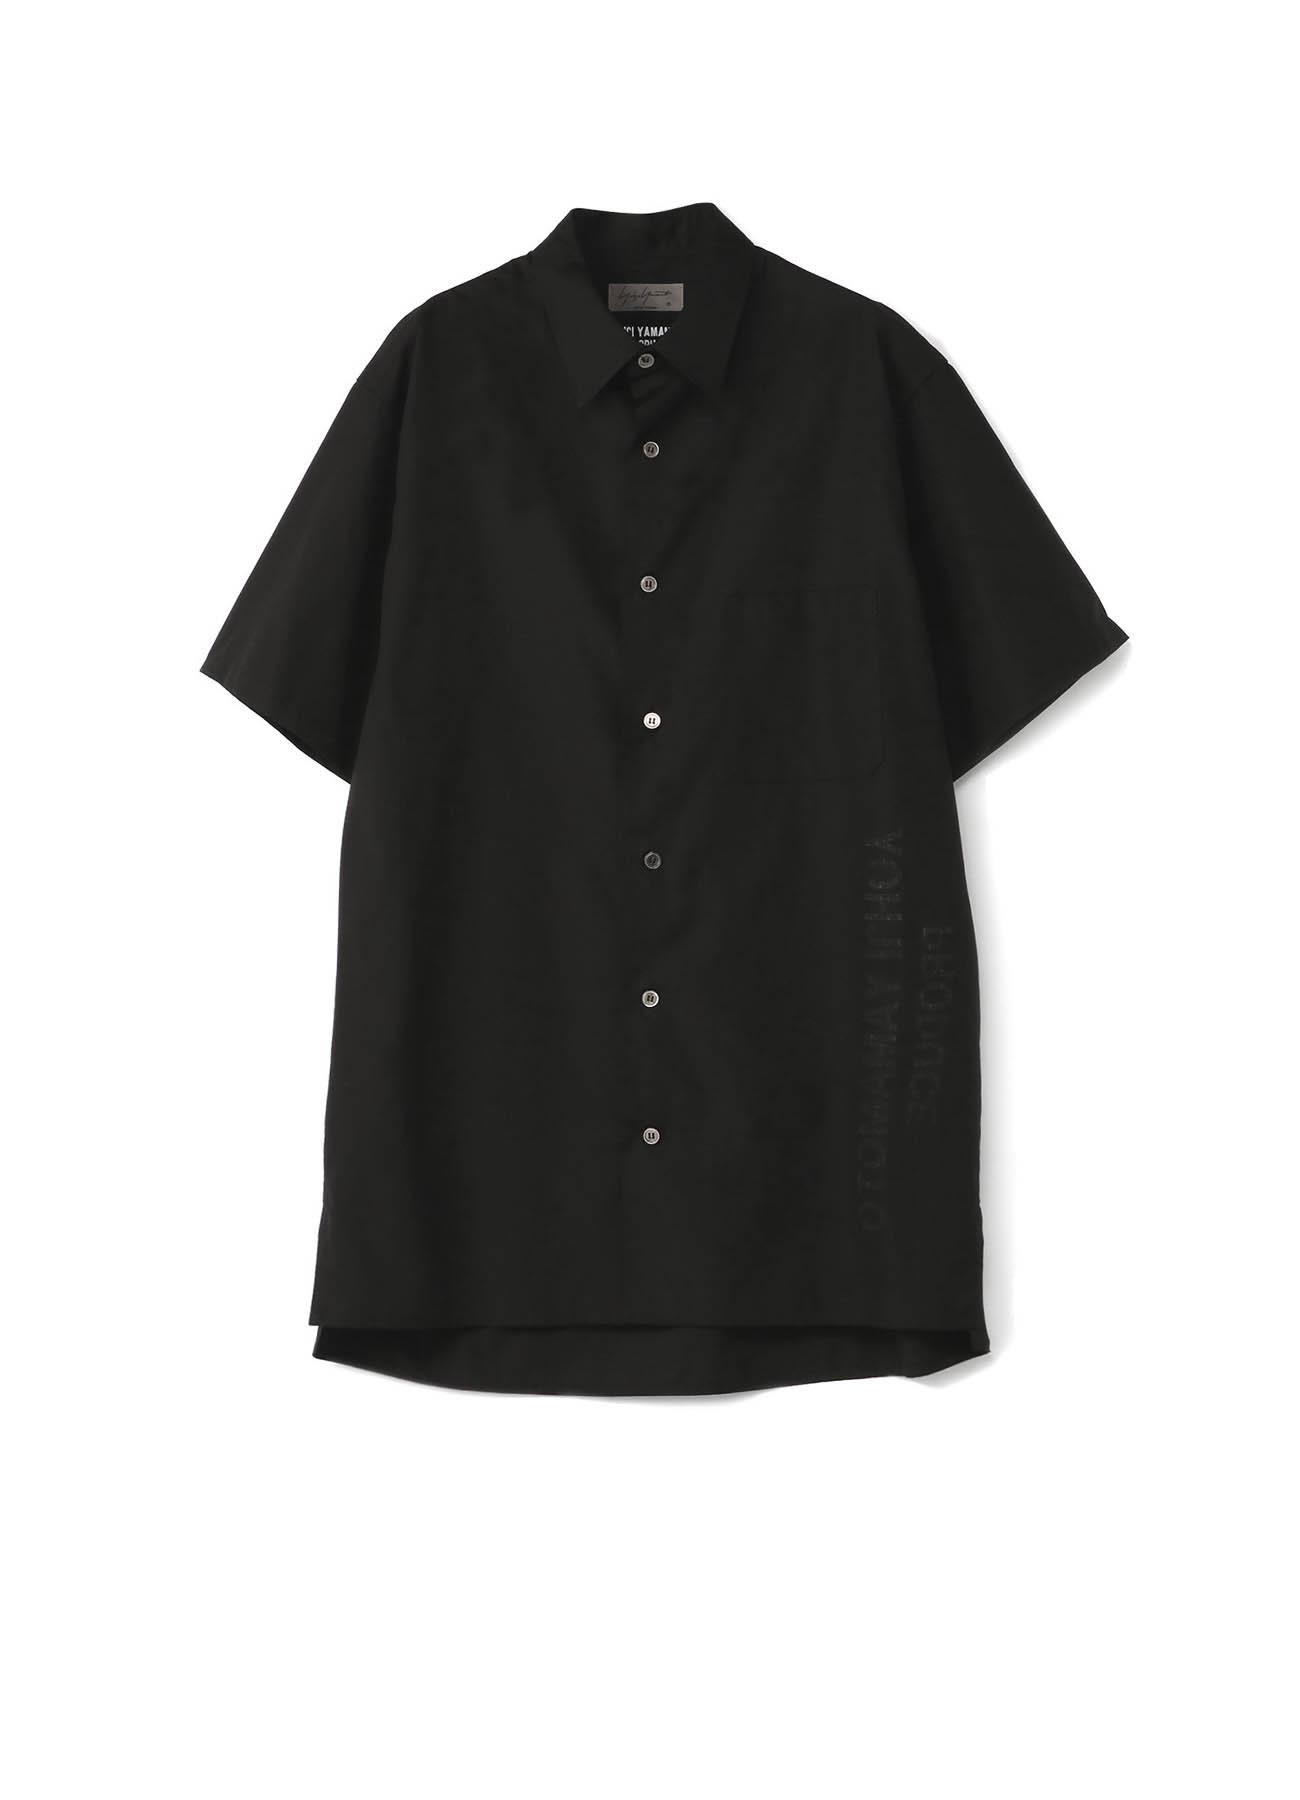 【THE SHOP】限量版宽松短袖衬衫